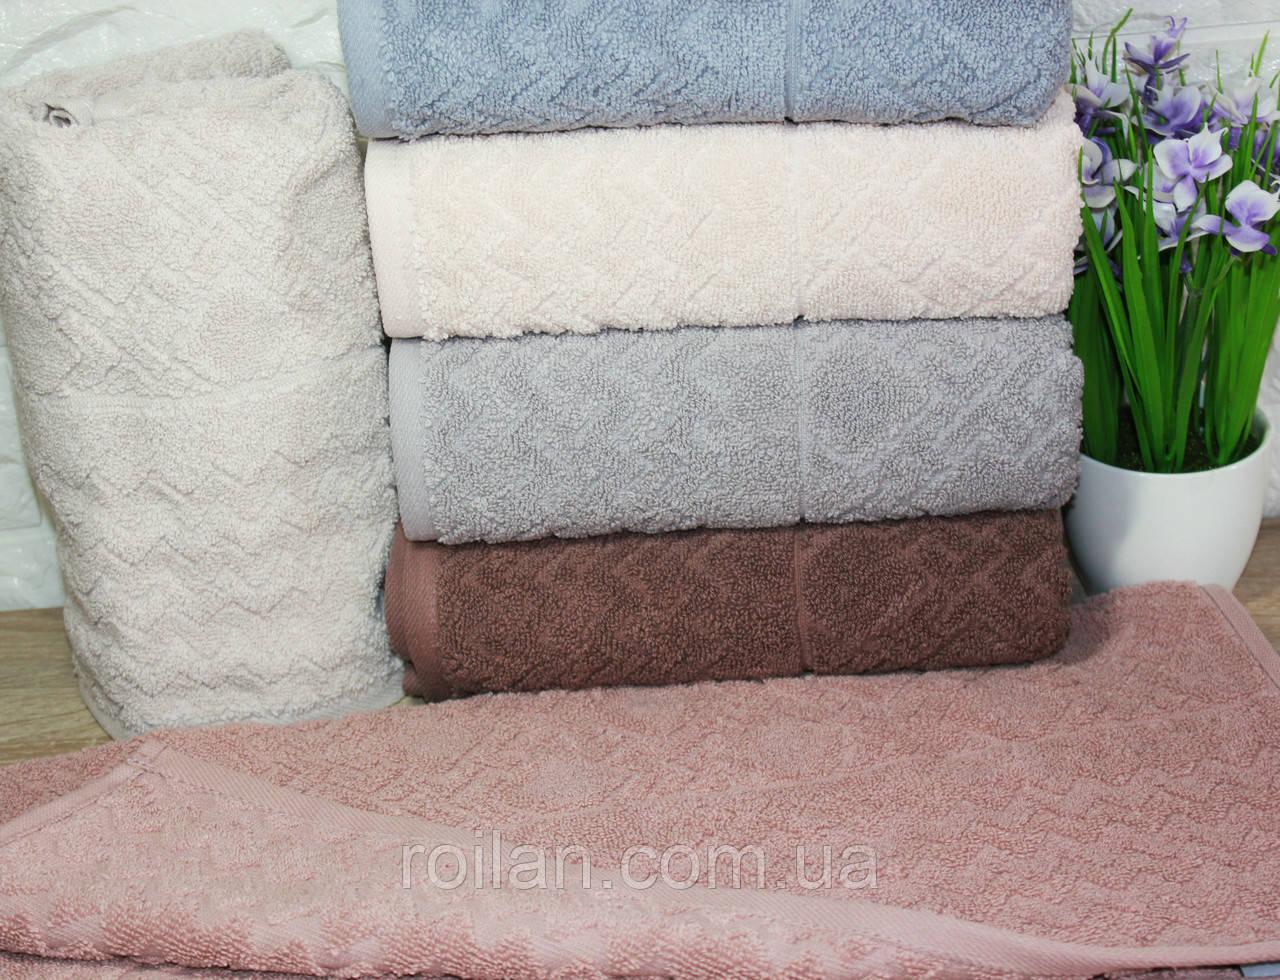 Банные турецкие полотенца Lux Grand